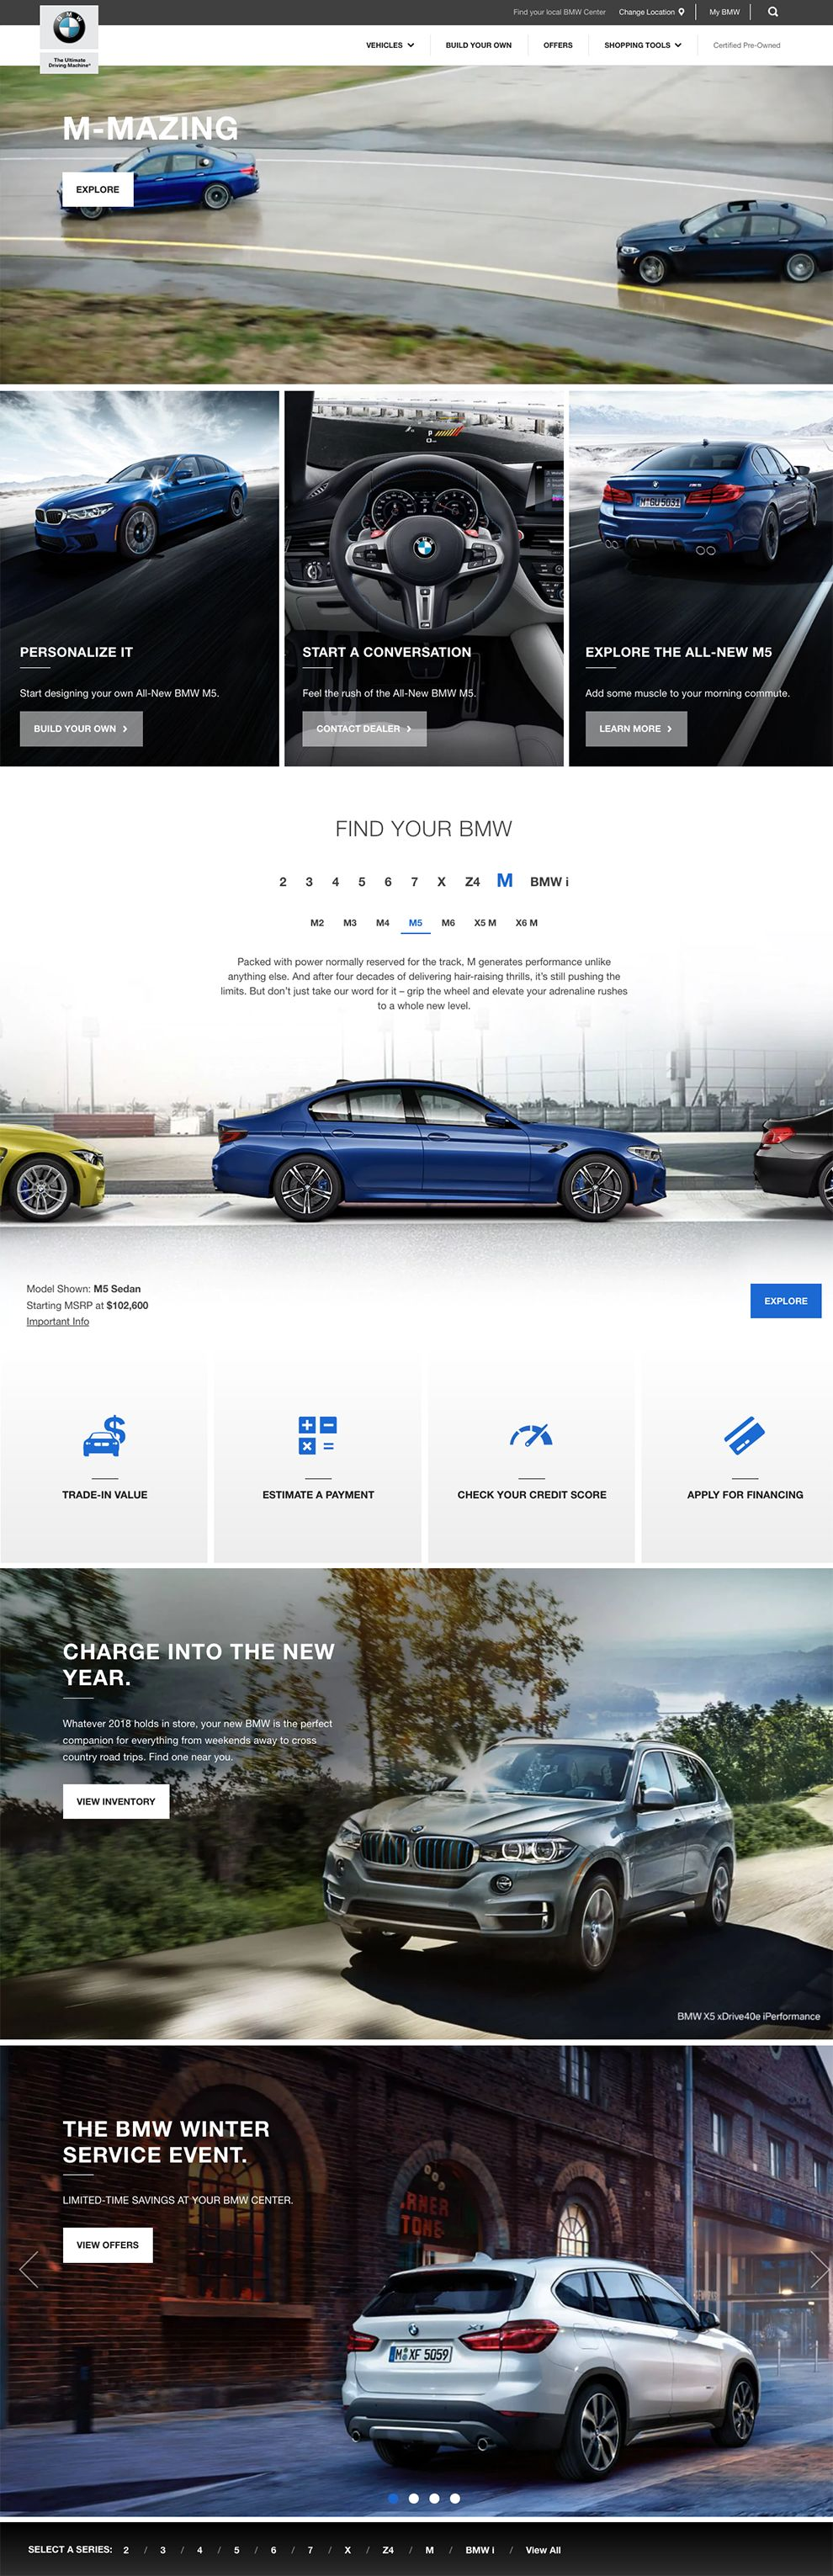 BMW USA Sleek Homepage Design